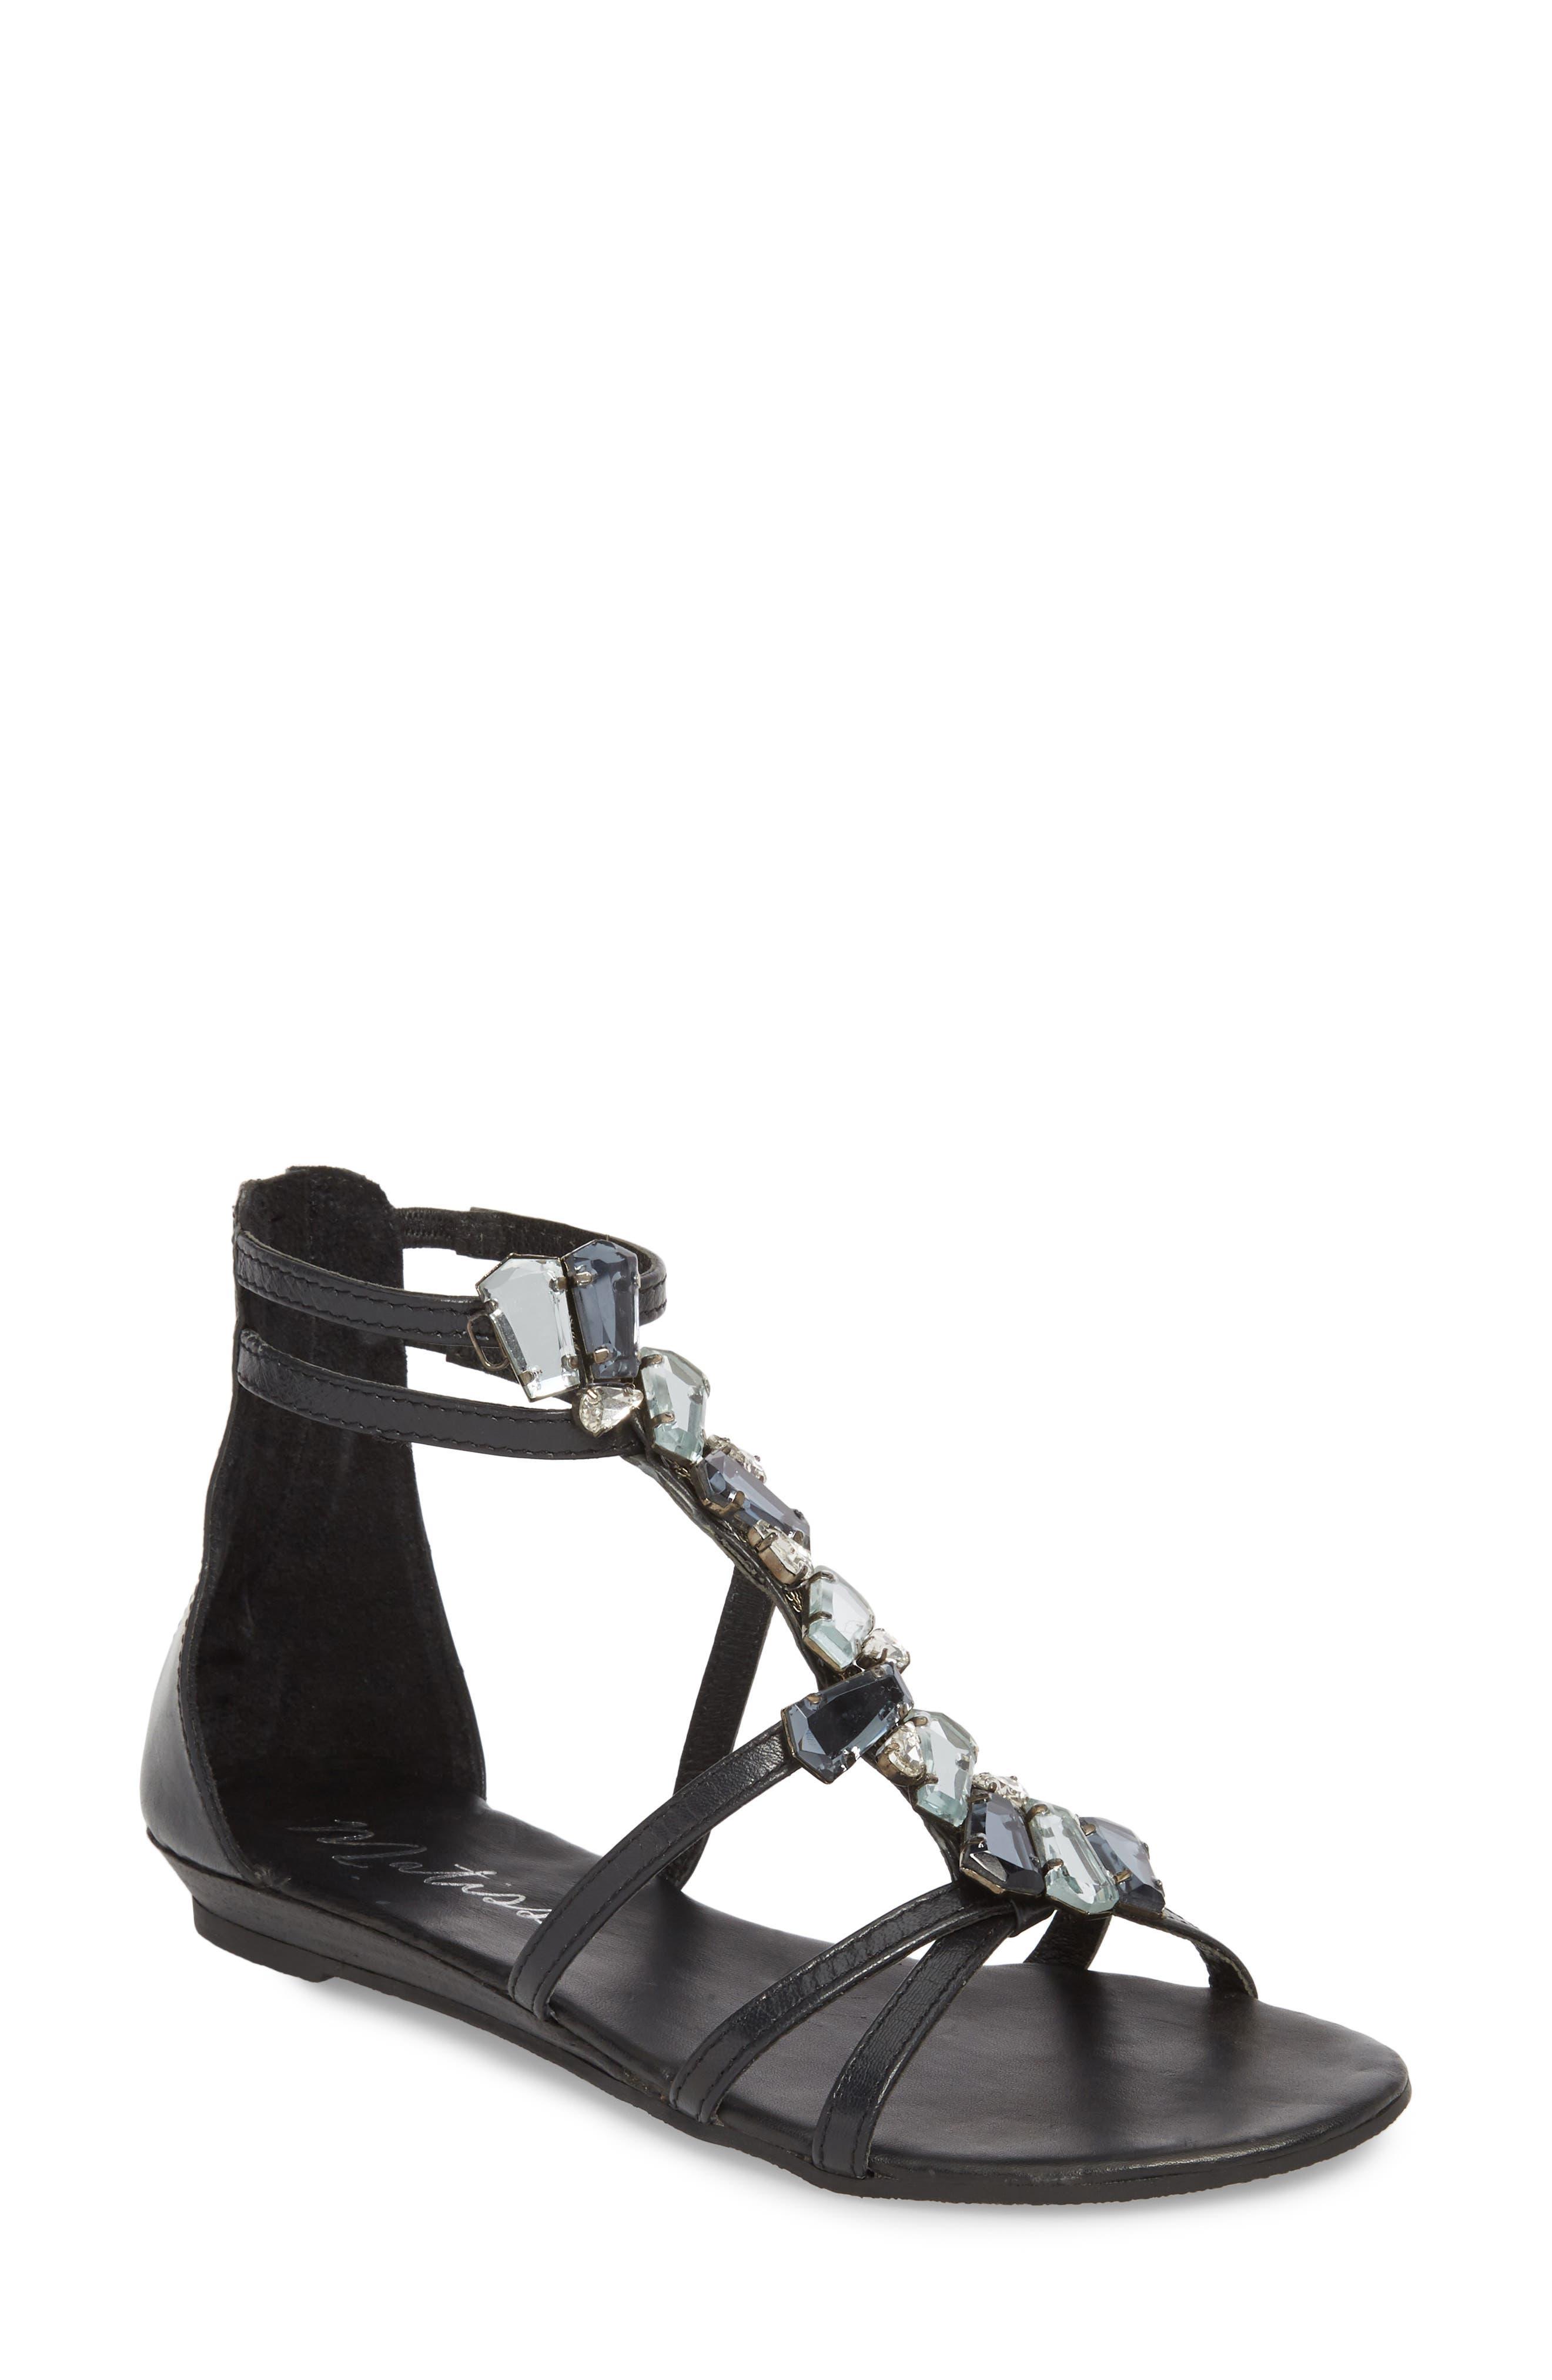 Didi Crystal Embellished Sandal,                             Main thumbnail 1, color,                             BLACK LEATHER